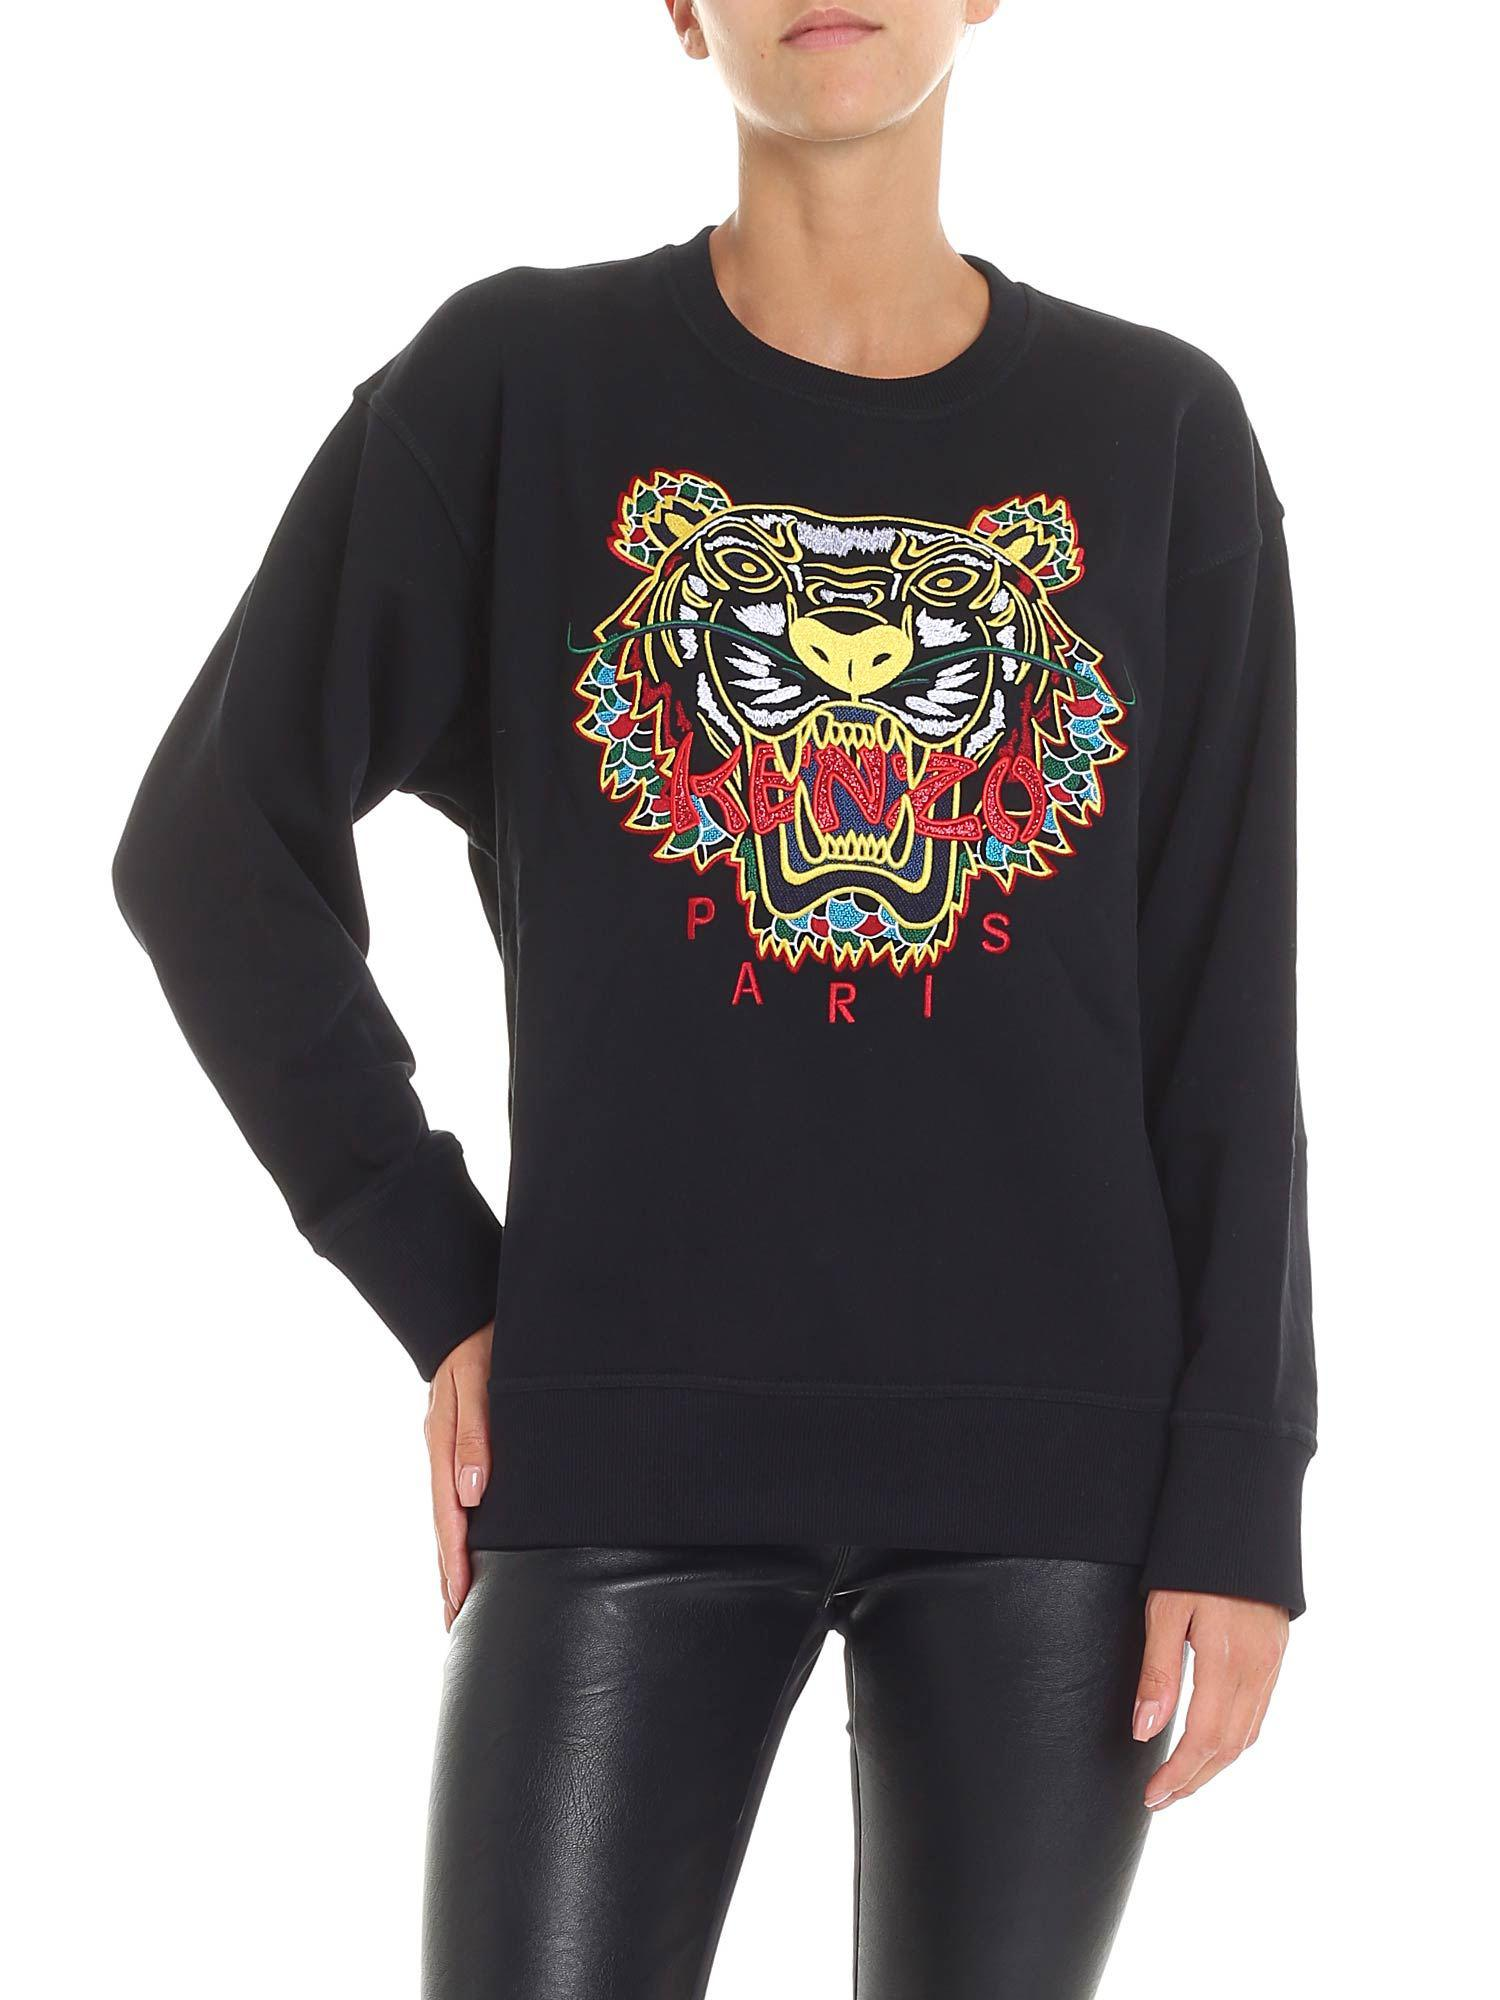 c8575943 KENZO Black Tiger Relax Sweatshirt in Black - Save 10% - Lyst